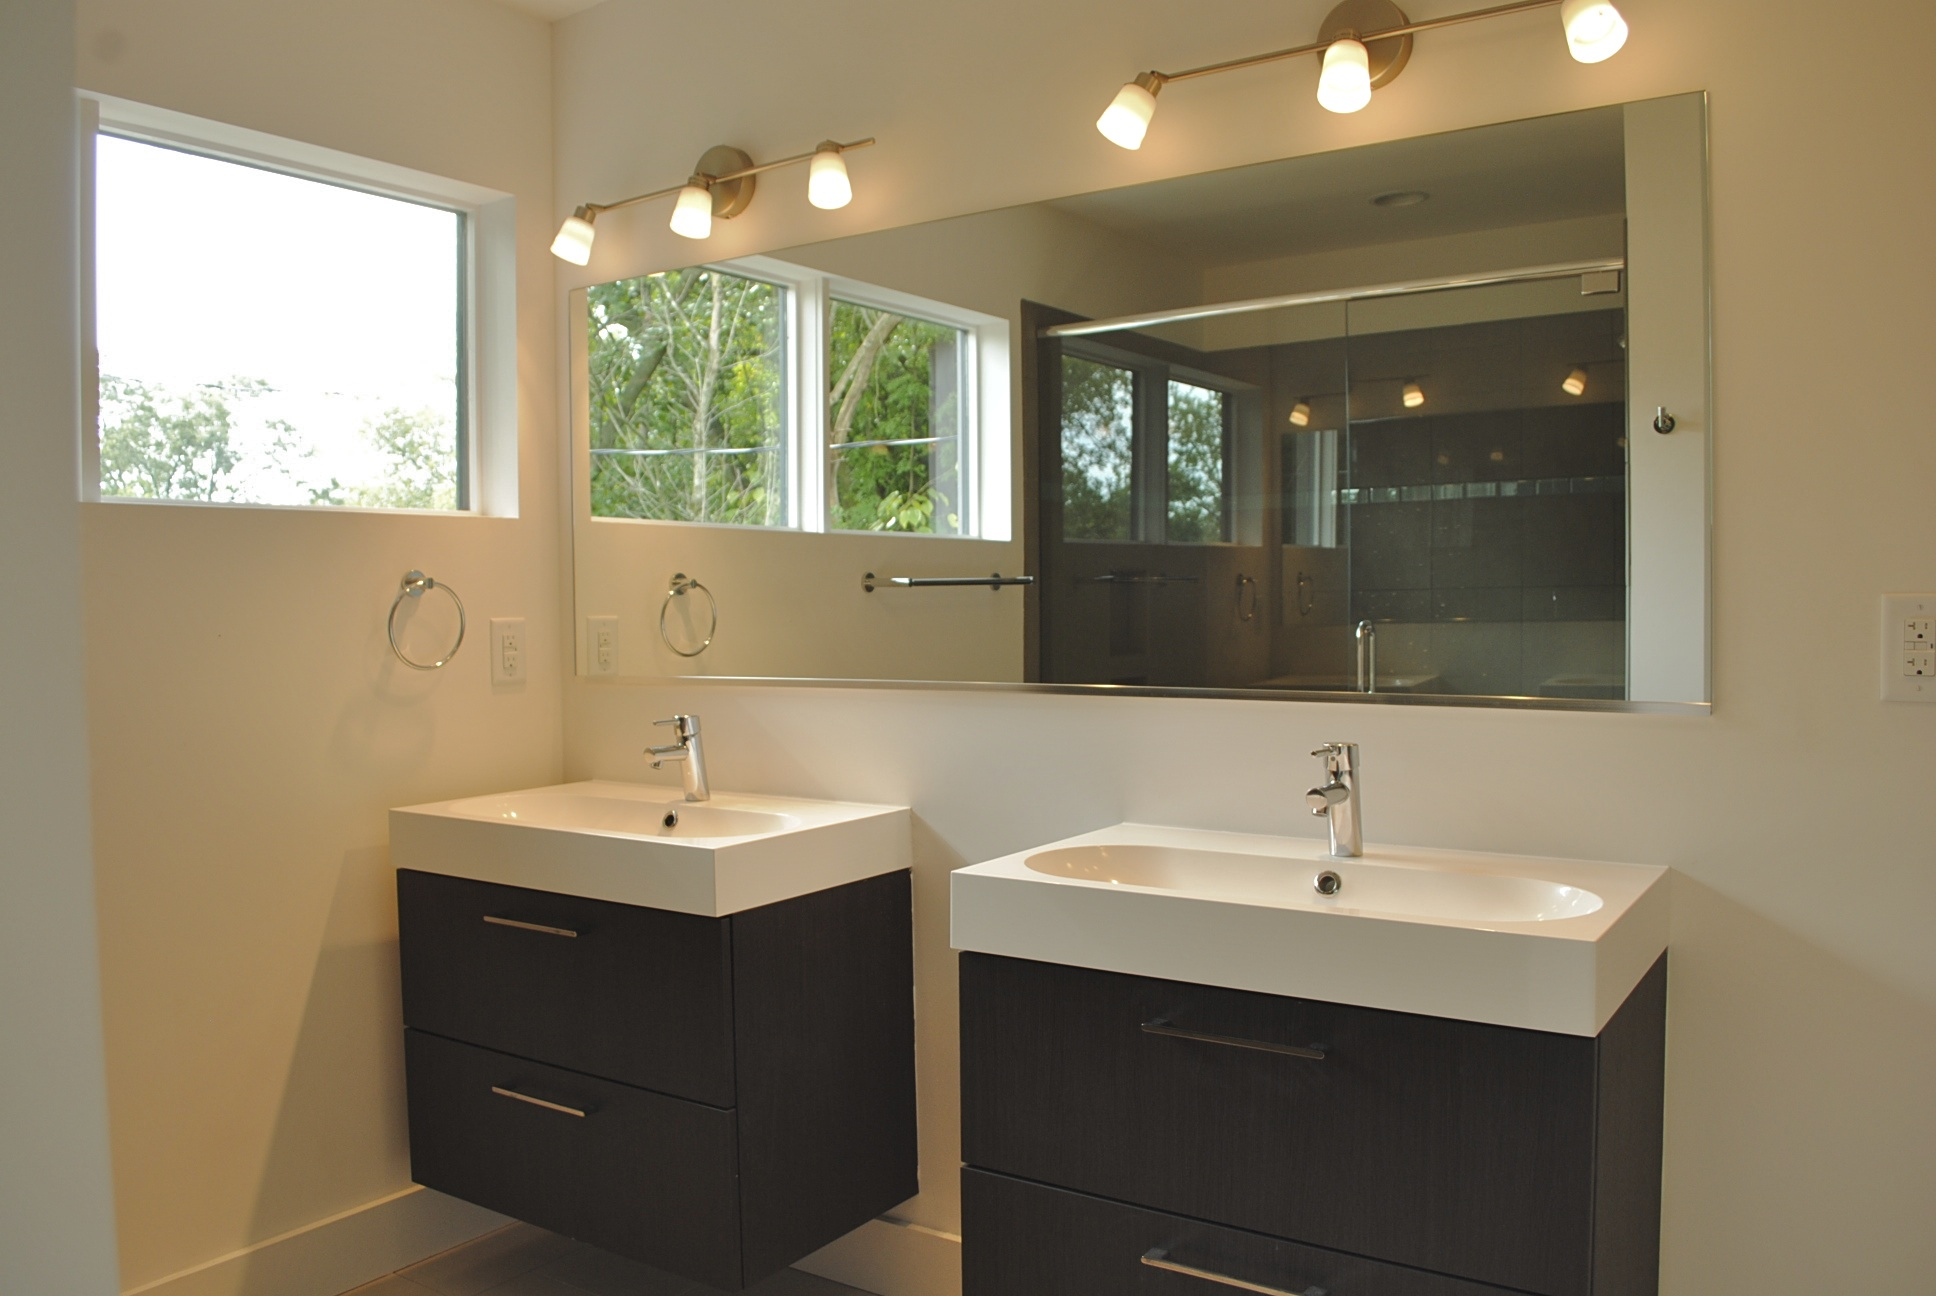 Ikea Bathroom Vanities A bathroom of equals